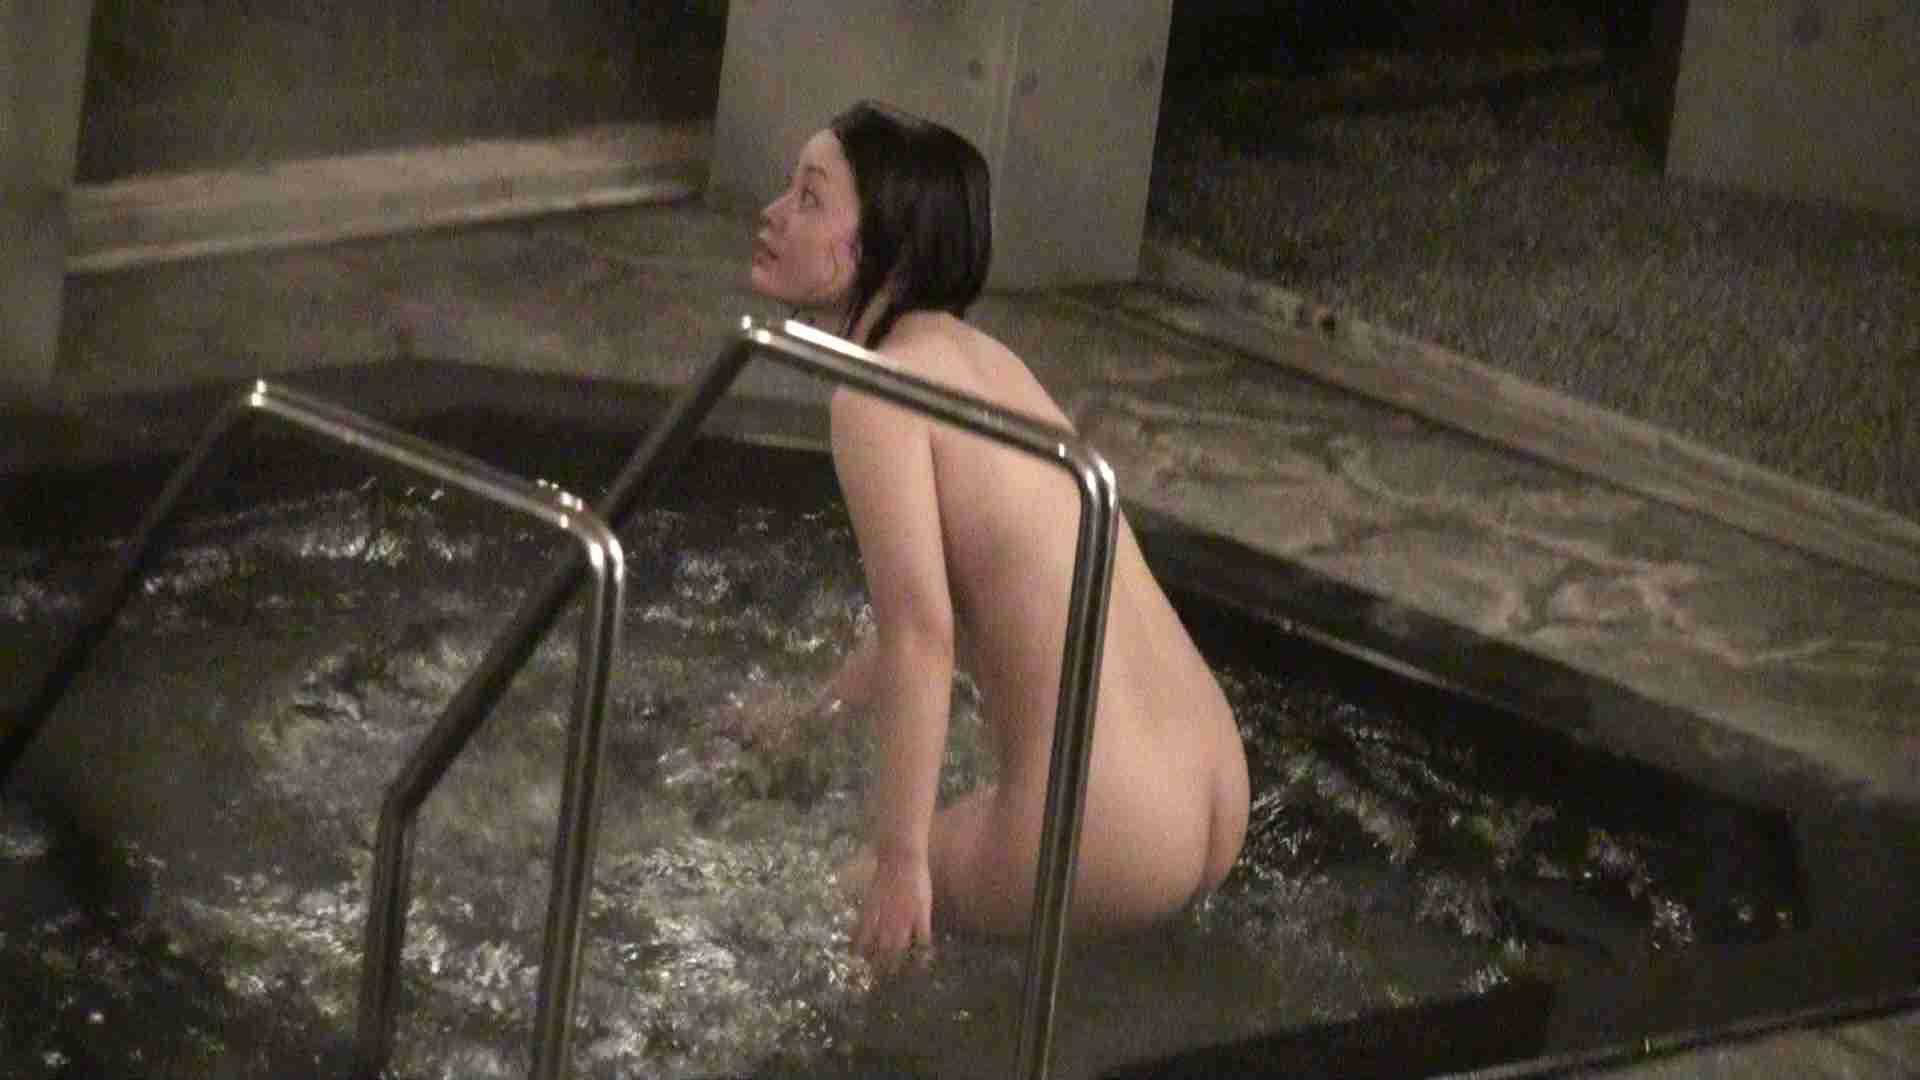 Aquaな露天風呂Vol.404 露天 おめこ無修正動画無料 112pic 31